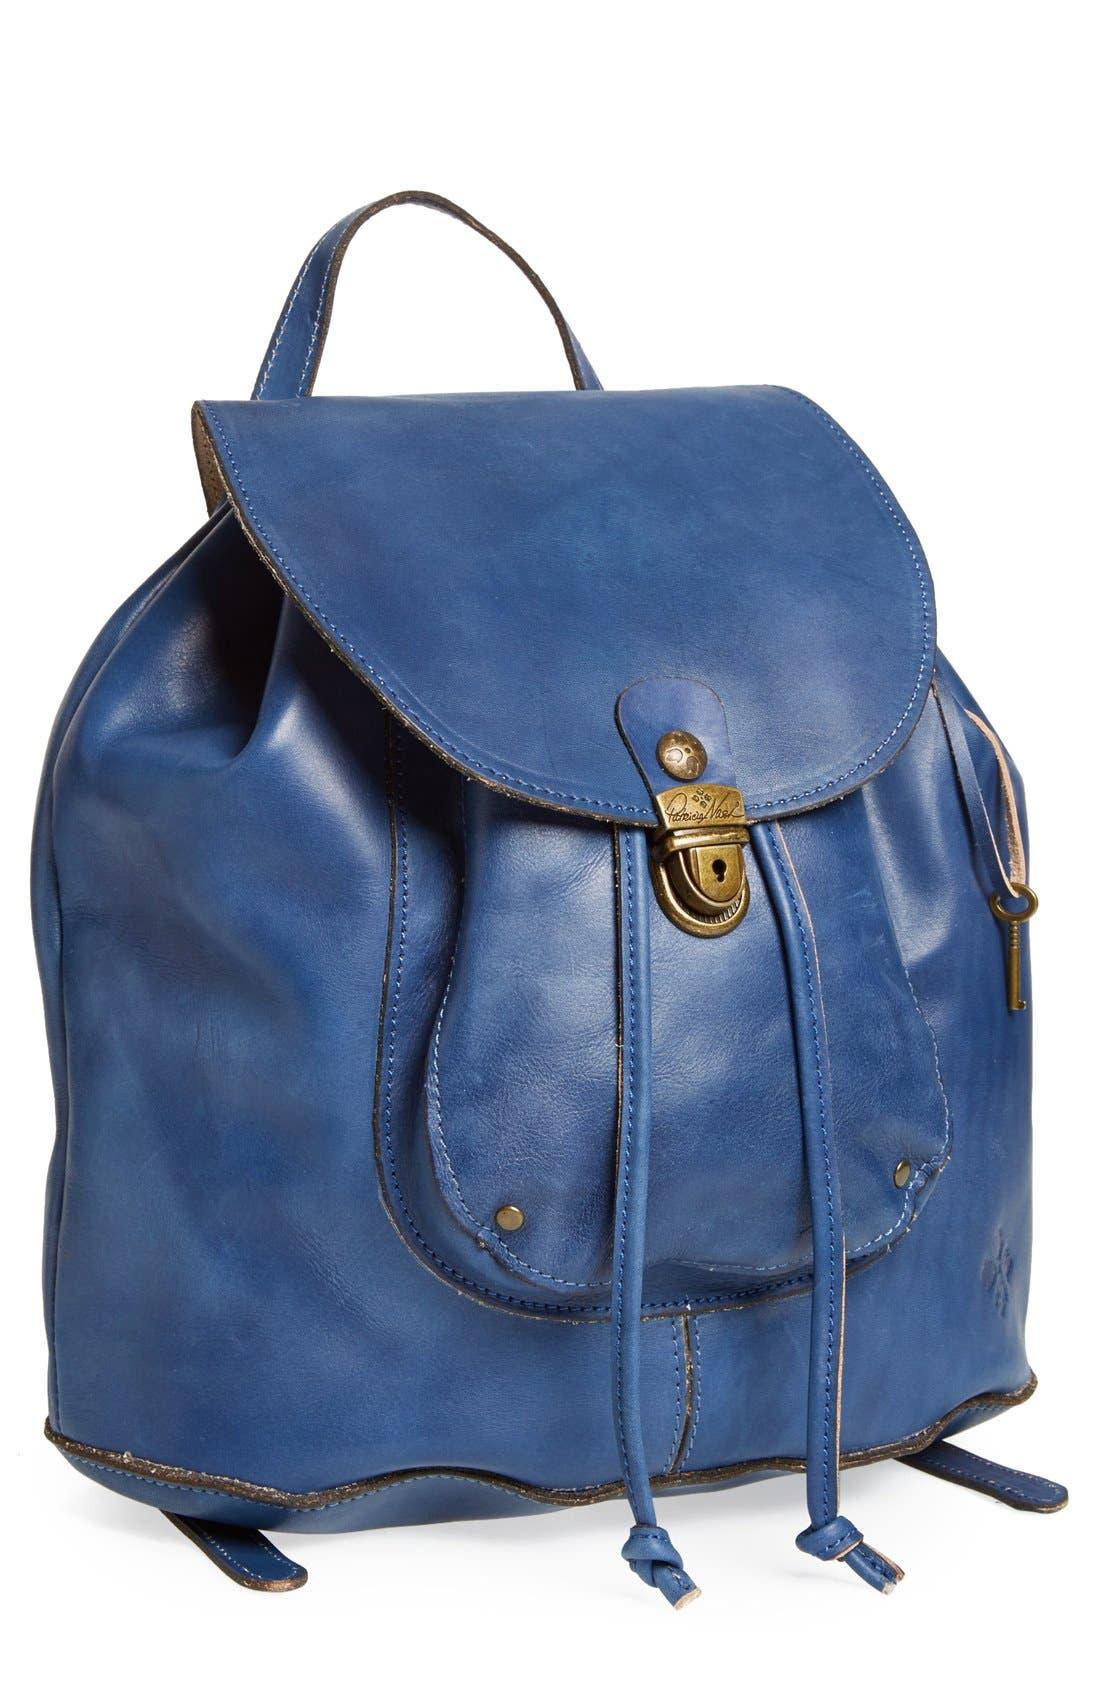 Alternate Image 1 Selected - Patricia Nash 'Casape' Backpack